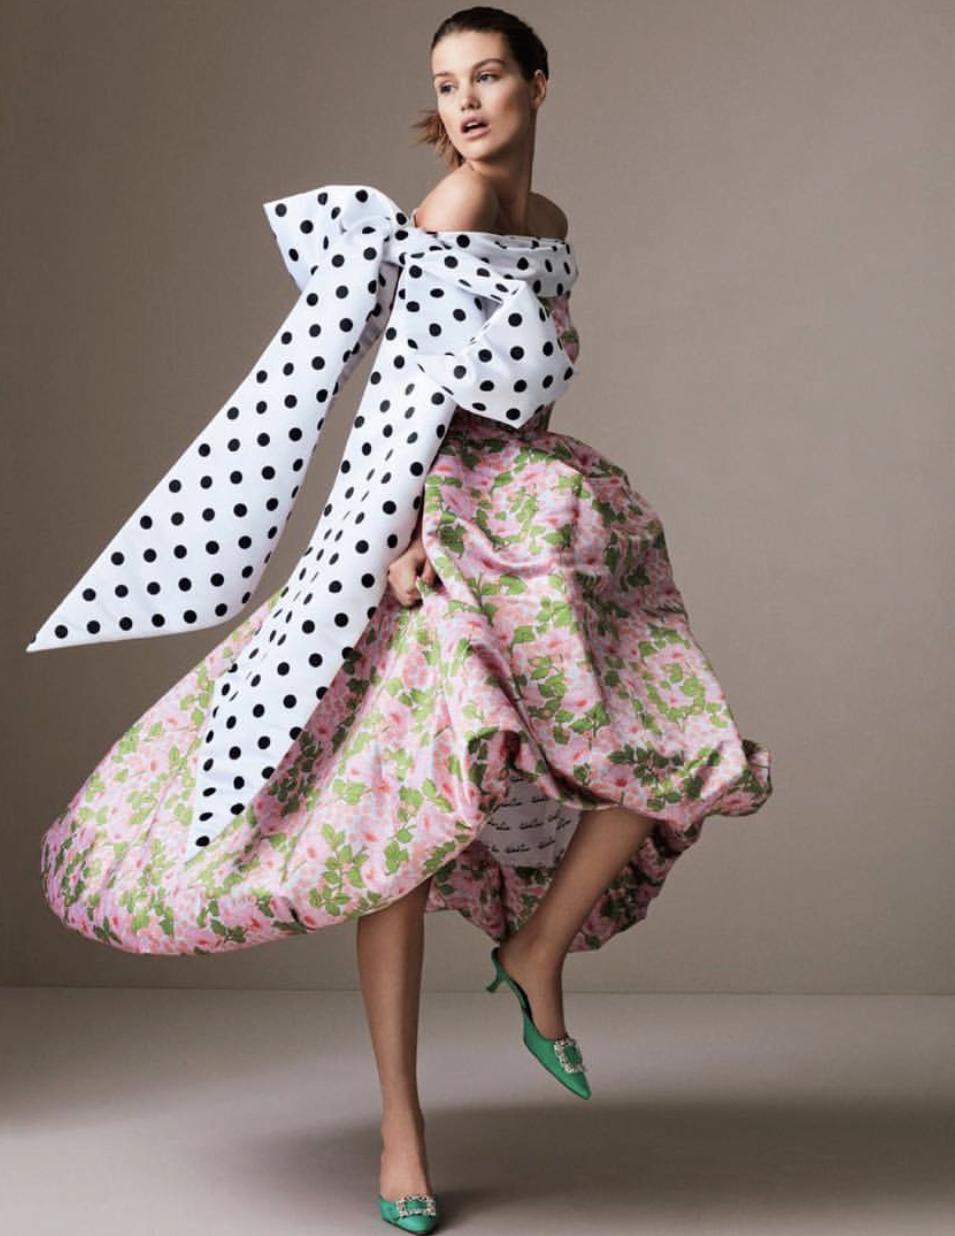 Paul Wetherell Vogue Japan Luna Bijl Jacob Mallinson Bird Sarah Jane Hoare Val Garland Piergiorgio Del Moro 3 April 2019    .jpg